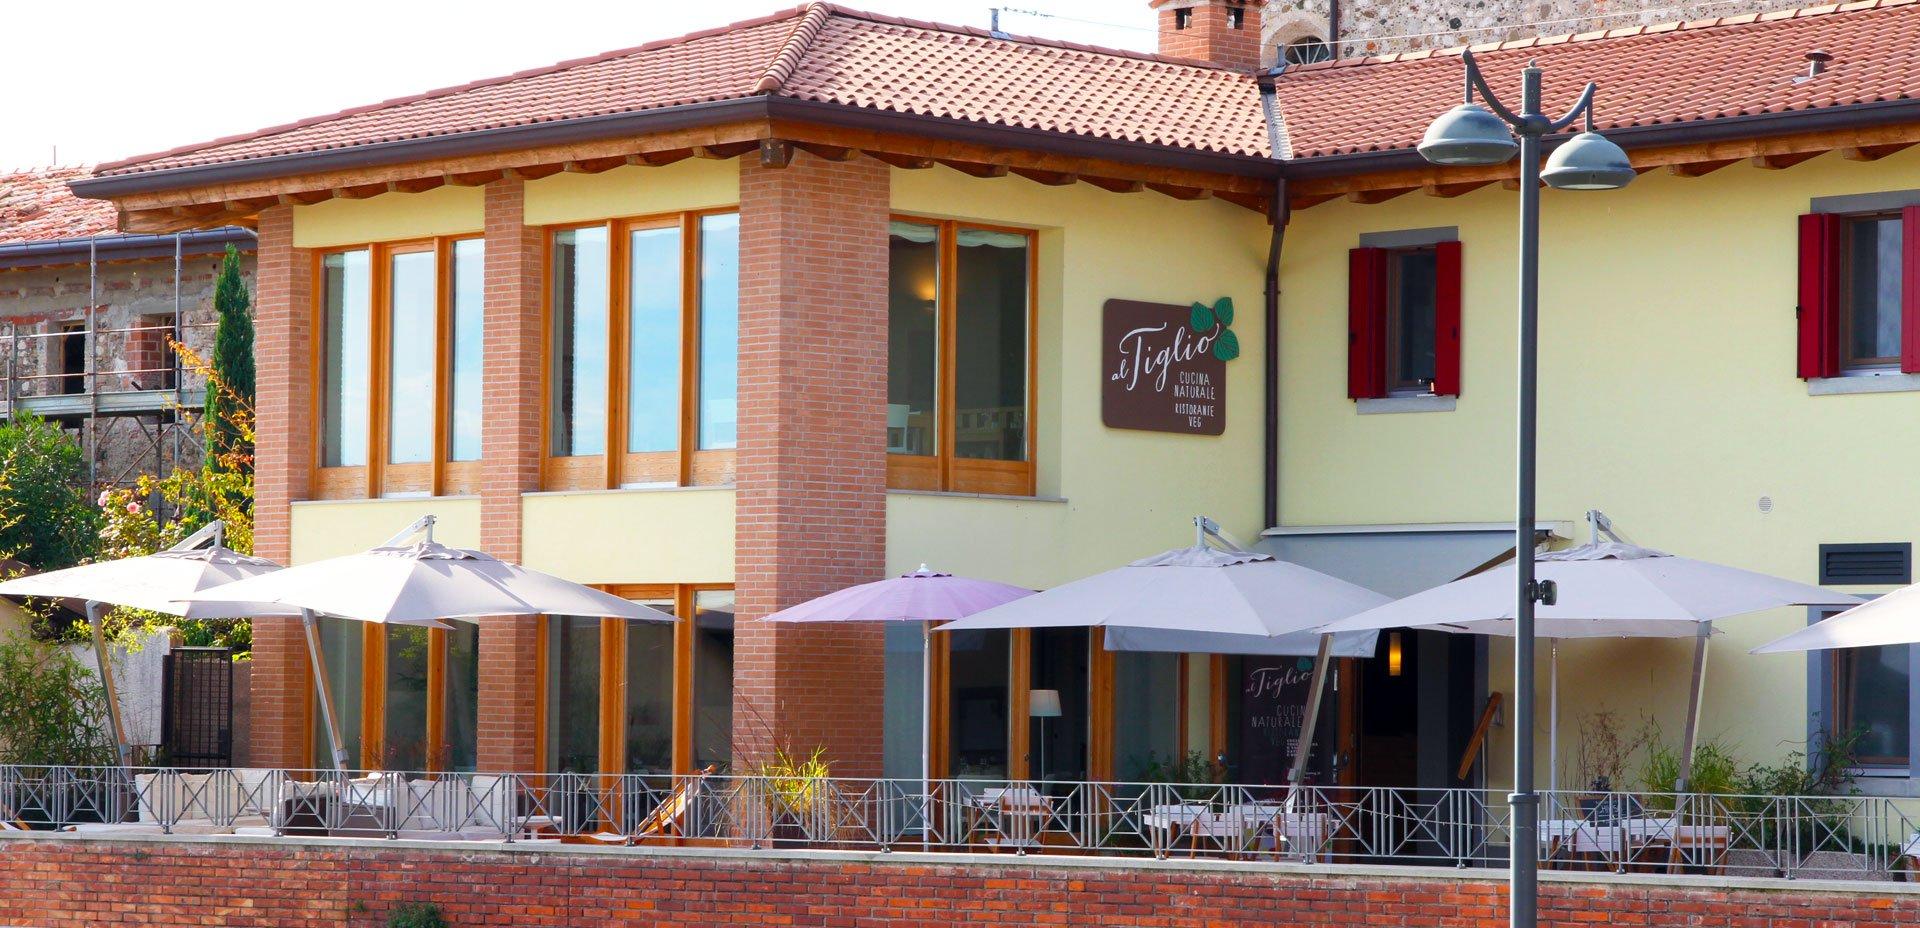 Ristorante vegano in Friuli